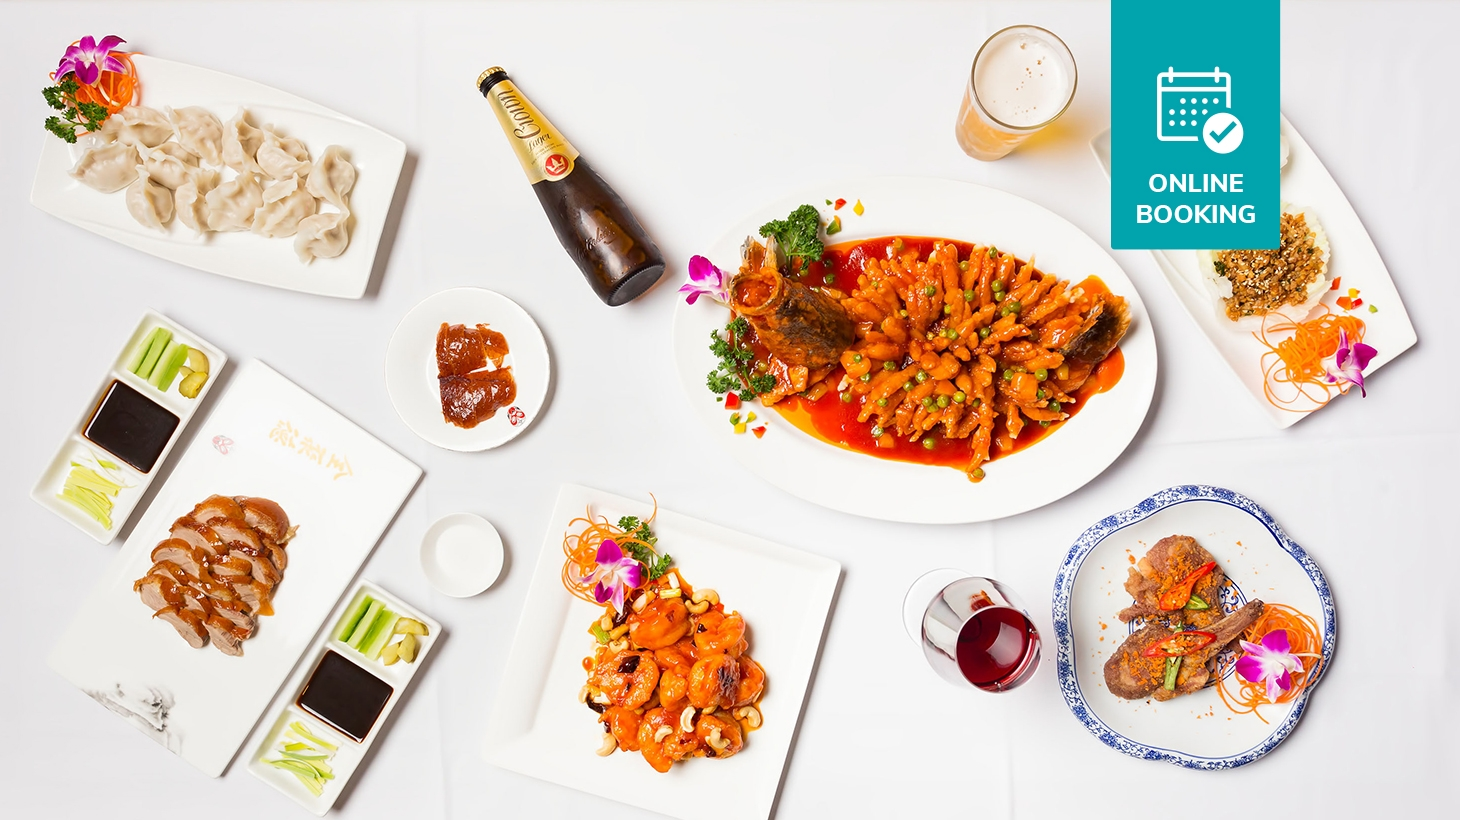 Dining & Restaurant Deals | Save Now | Scoopon